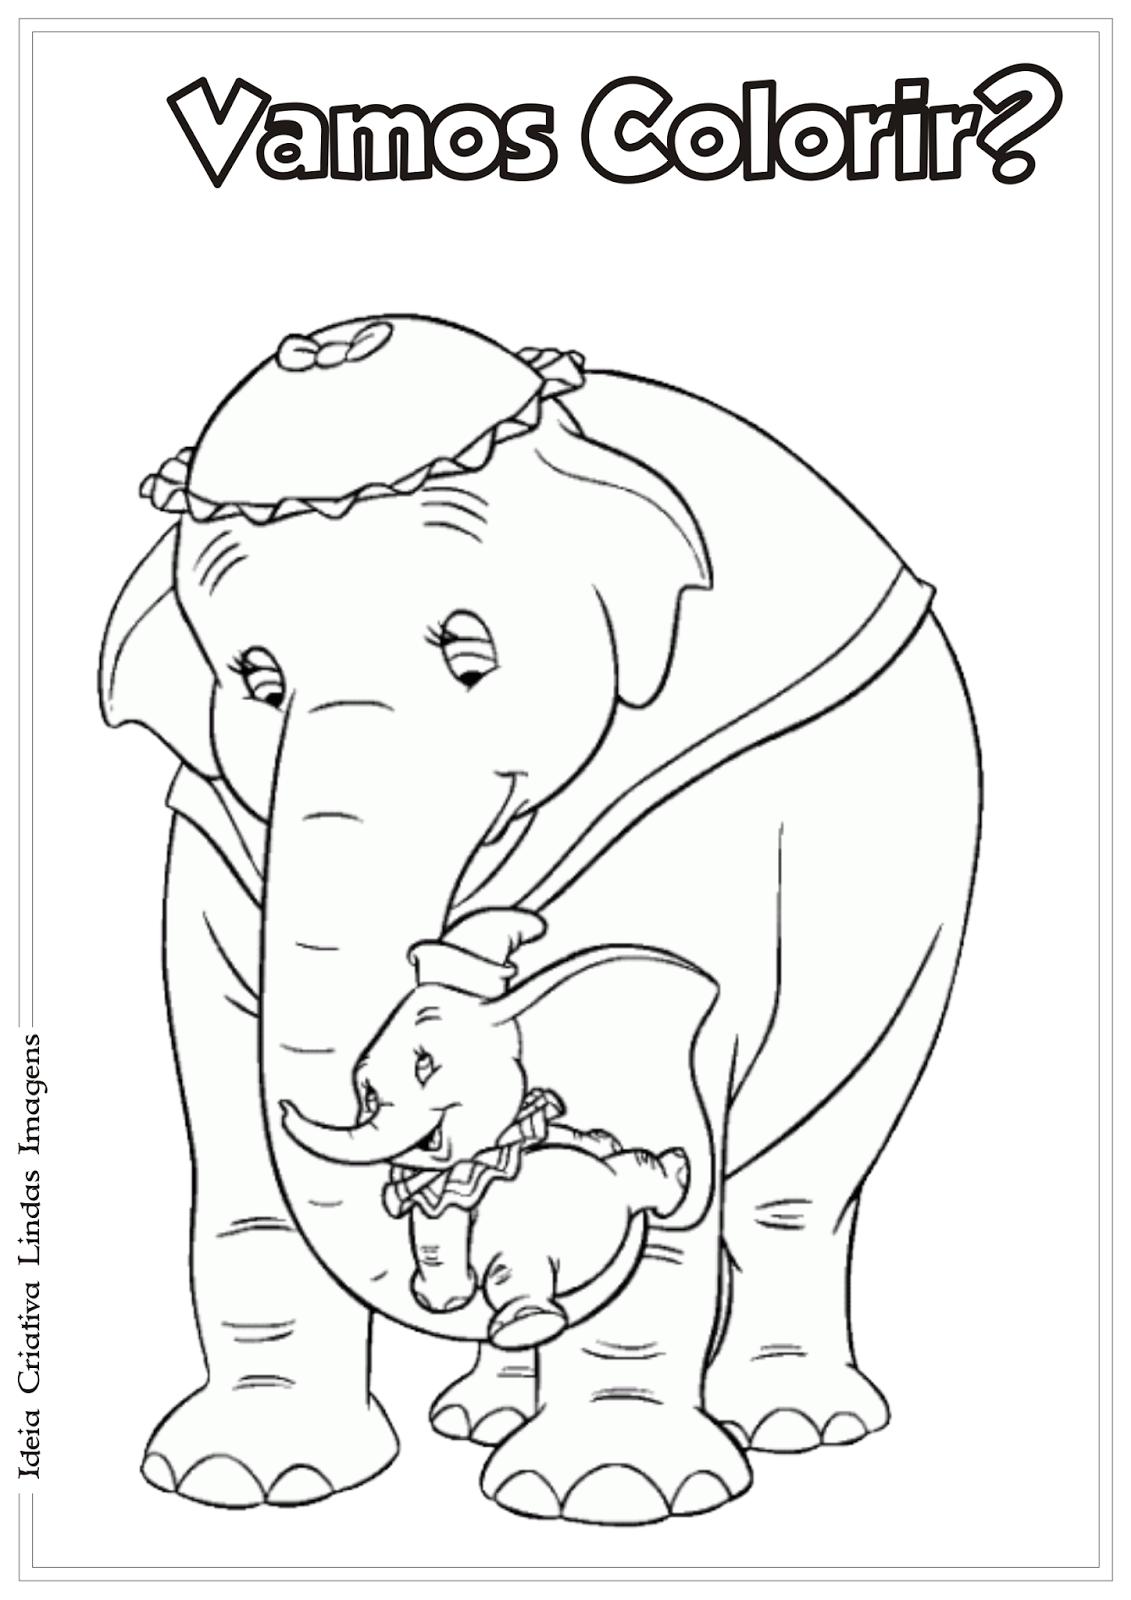 Dumbo desenho para colorir